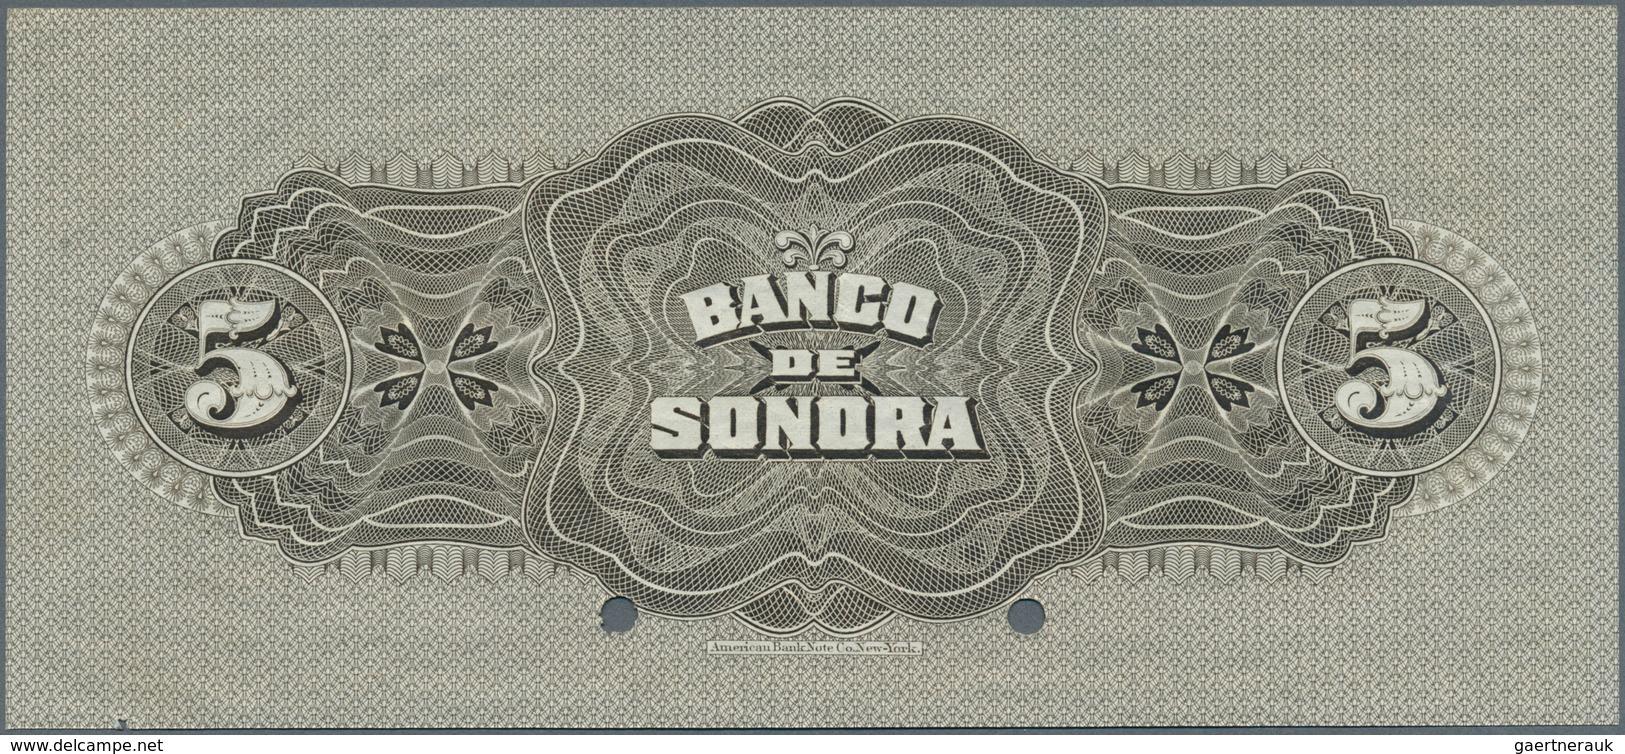 Mexico: El Banco De Sonora 5 Pesos 1911 SPECIMEN, P.S419s, Punch Hole Cancellation And Red Overprint - Mexico